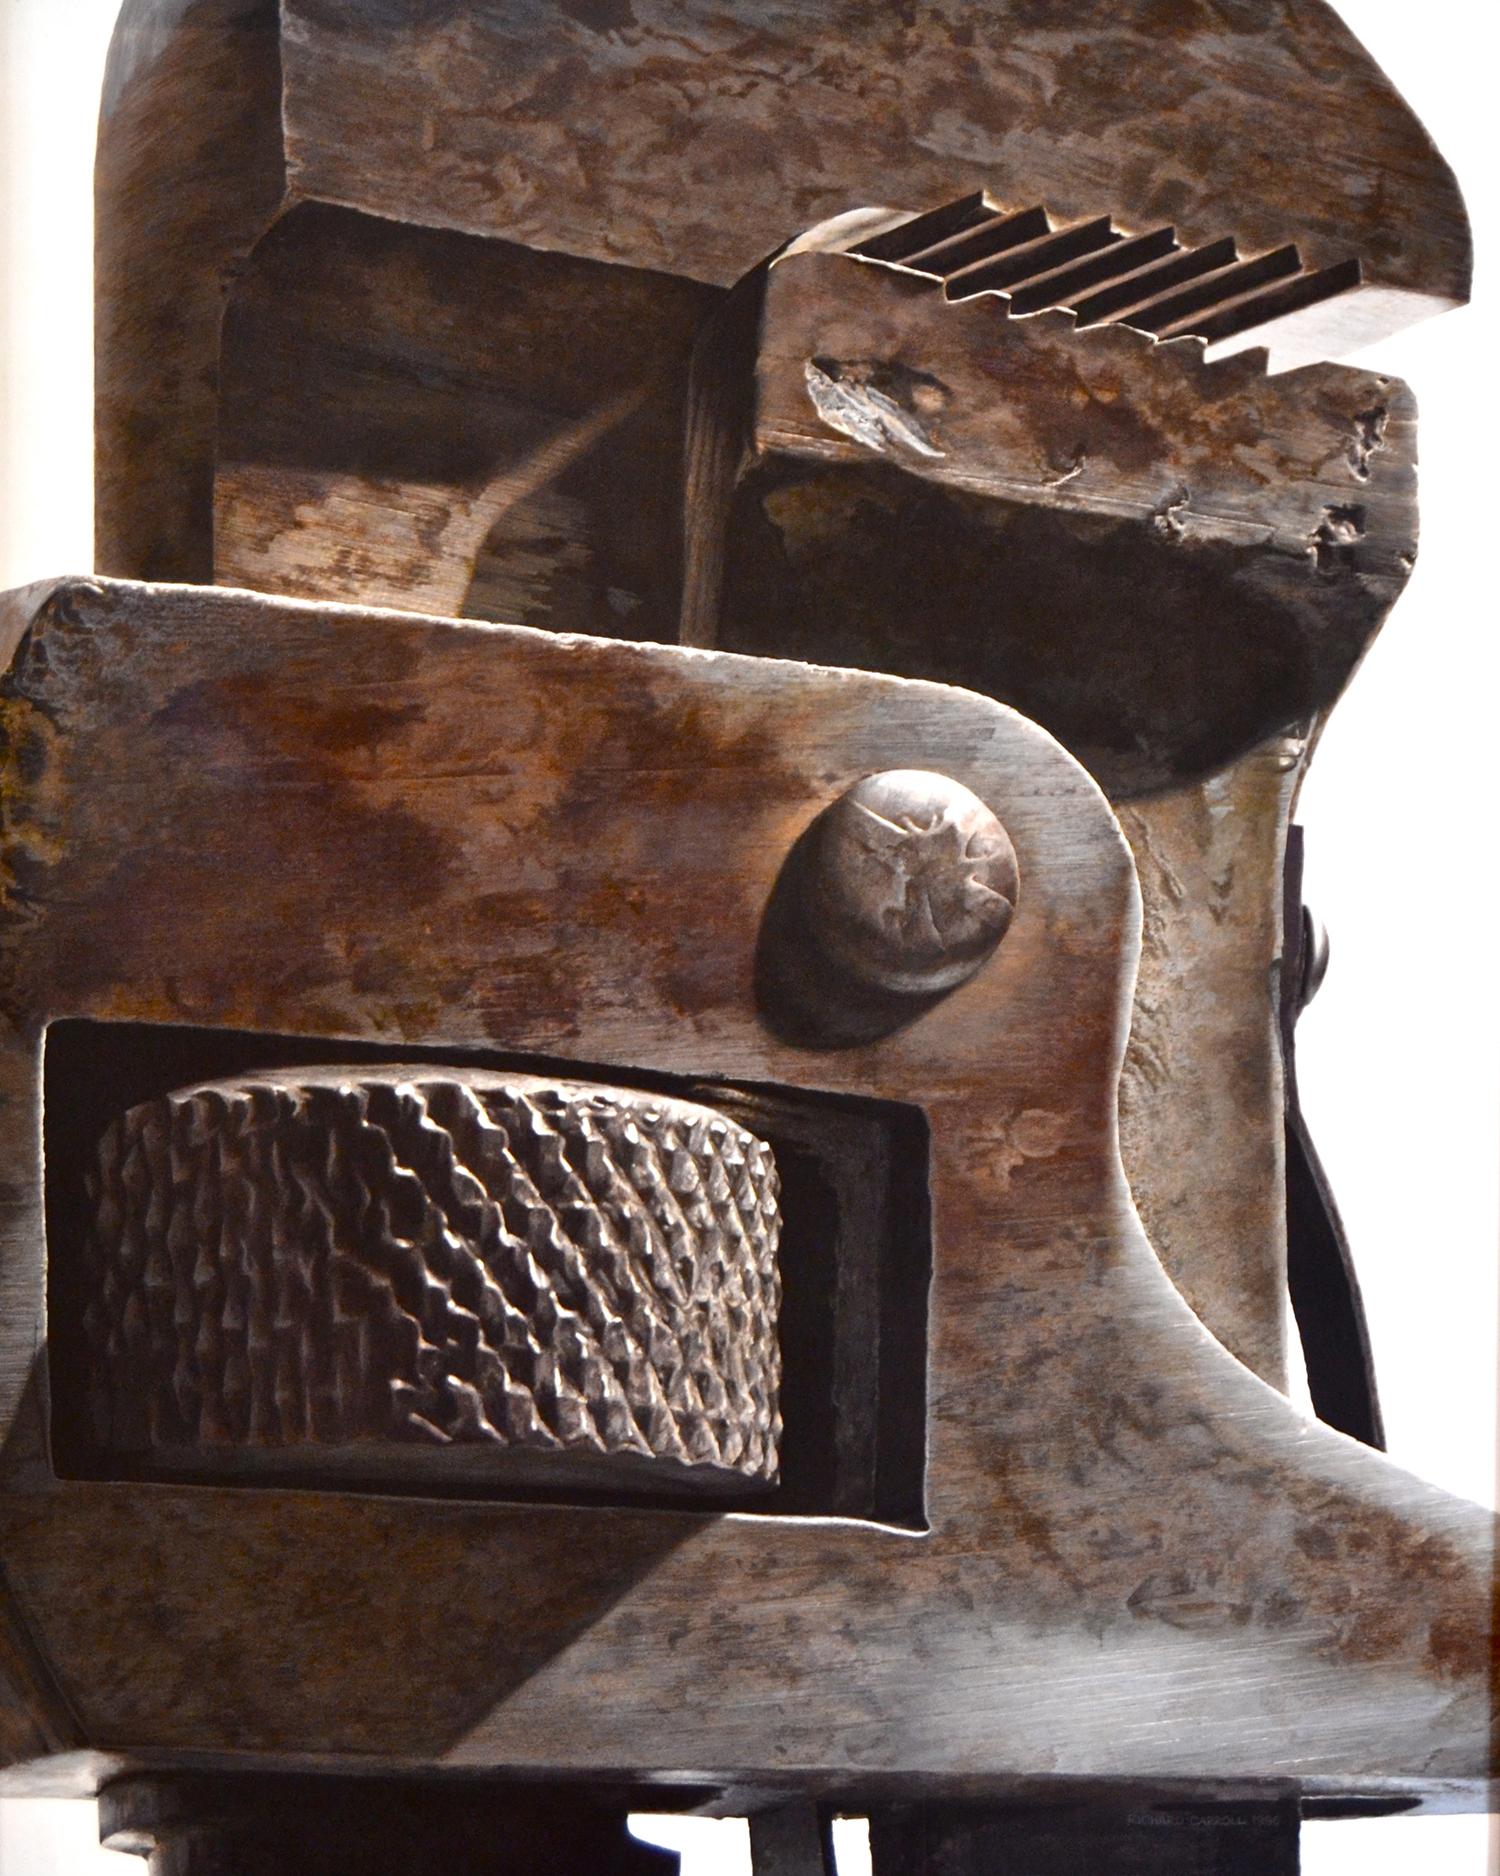 Dark Stilson , 1996 Egg tempera on panel 60 x 48 inches